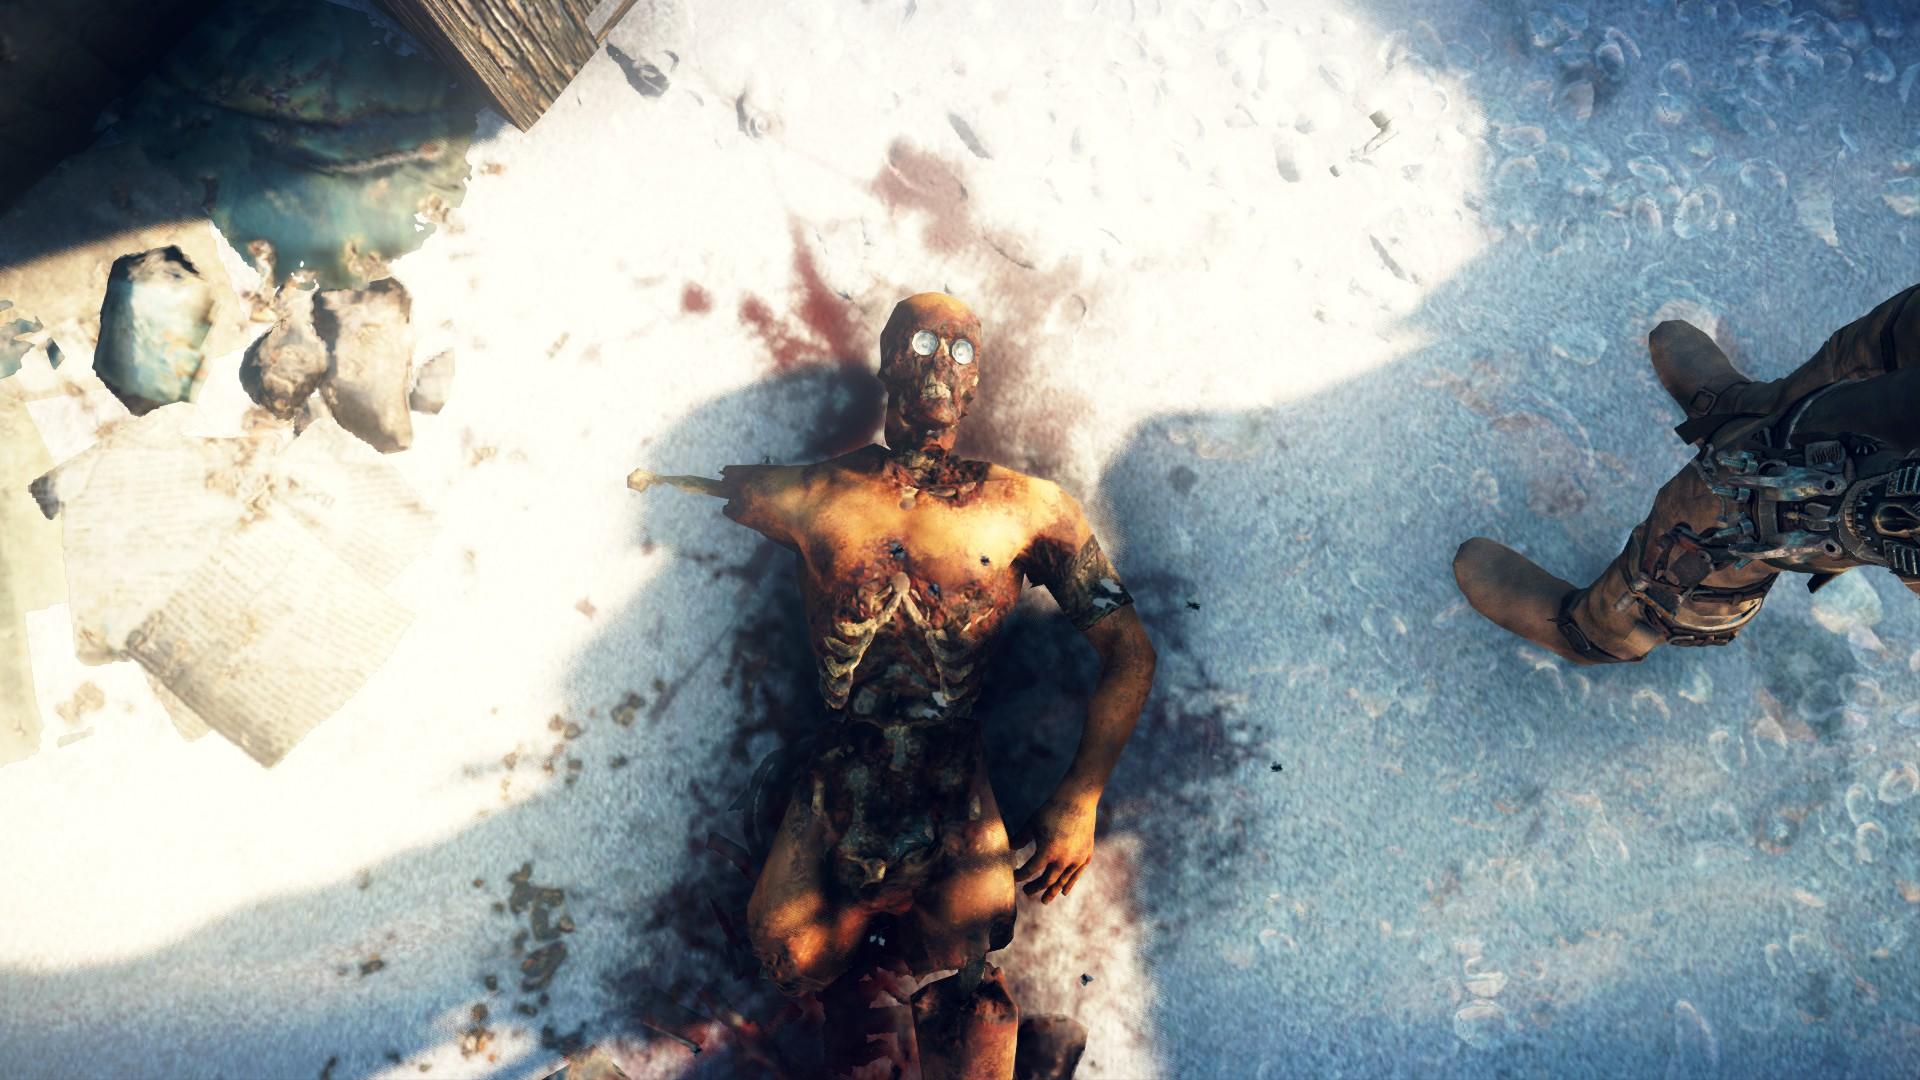 Photo of Jocul Mad Max afirma ca Half Life 3 este mort de mult timp